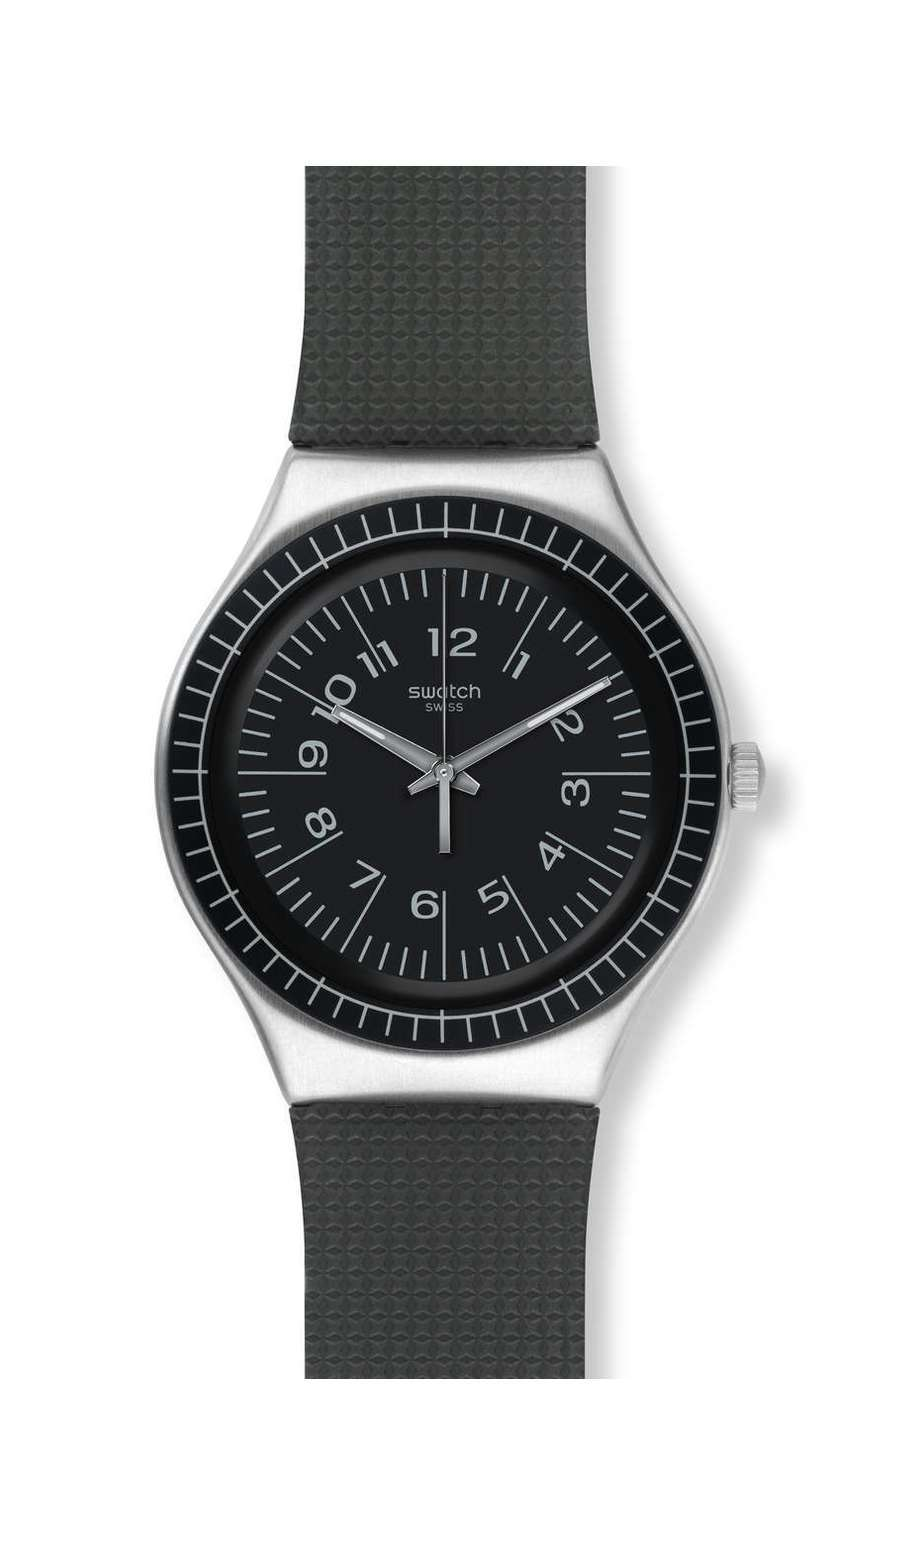 Swatch - KAKINUMA - 1